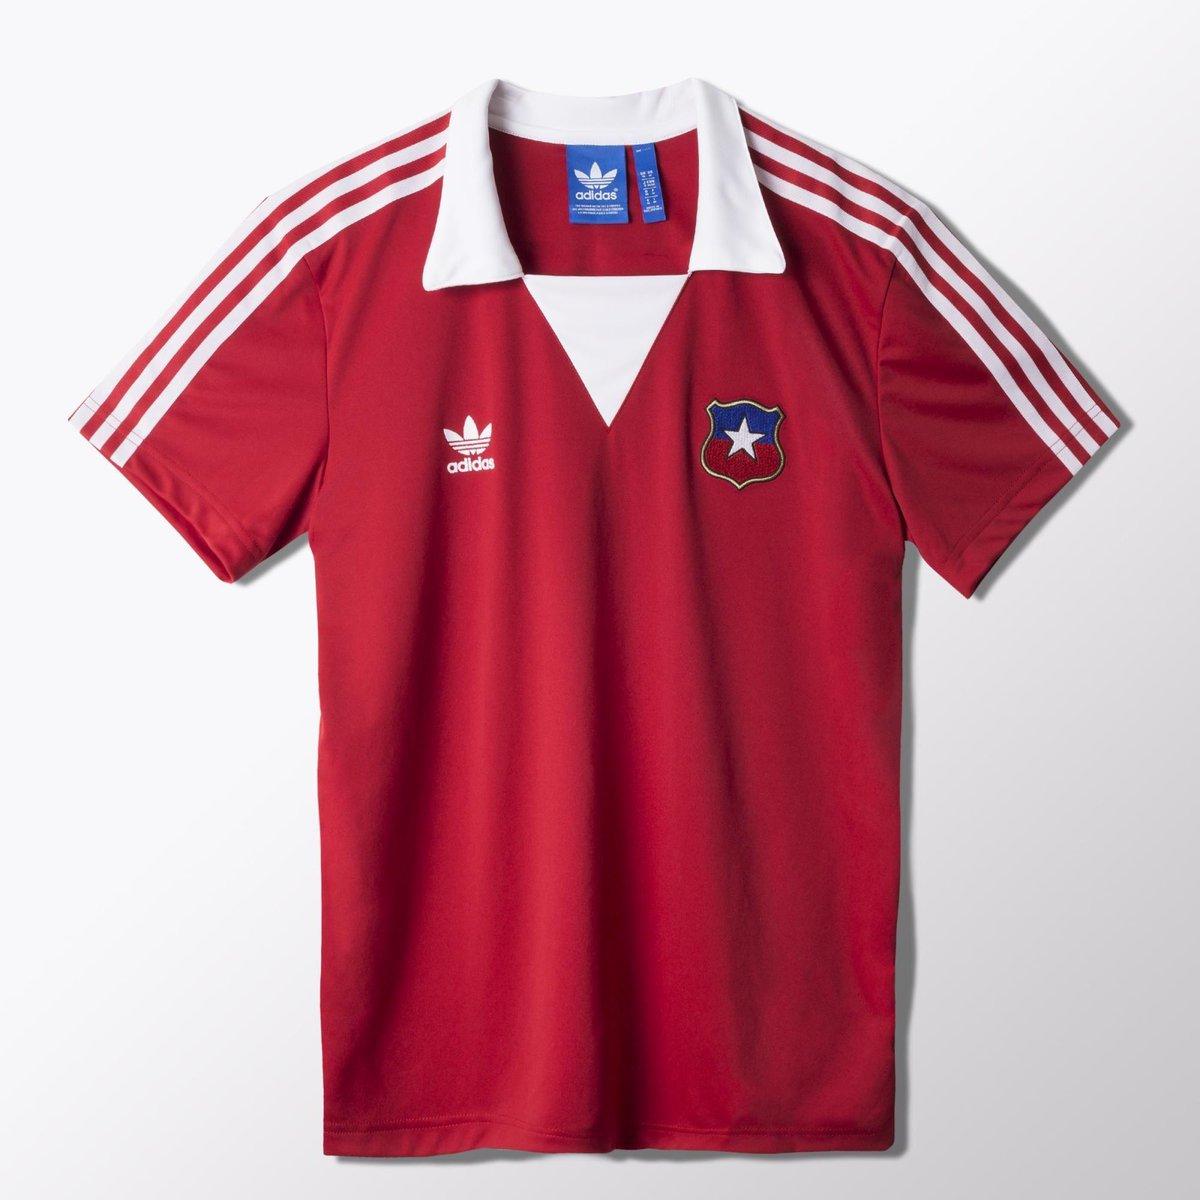 Moda  camiseta adidas originals de chile en españa 82 - scoopnest.com 9304ba166bc8b